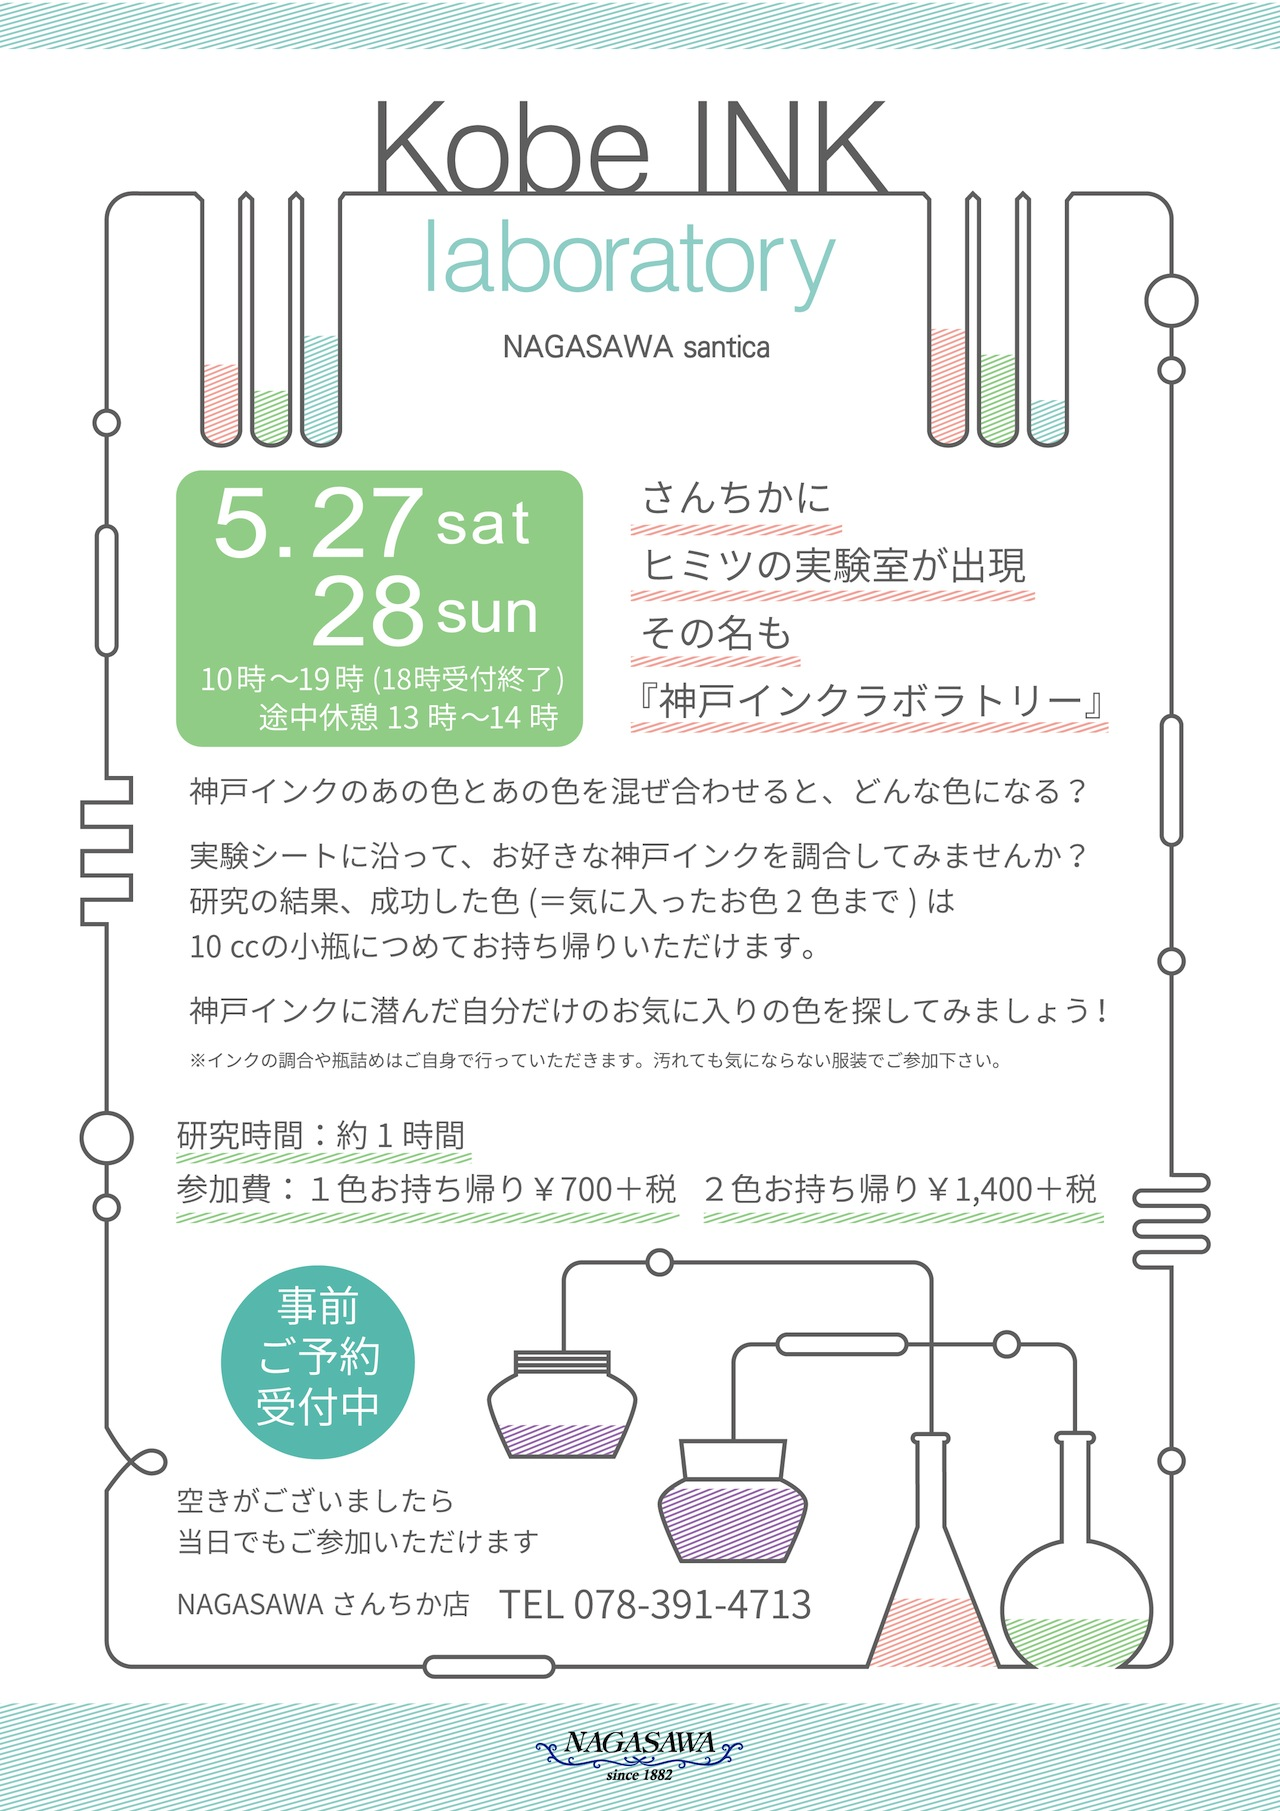 KOBE INK laboratory @NAGASAWAさんちか店